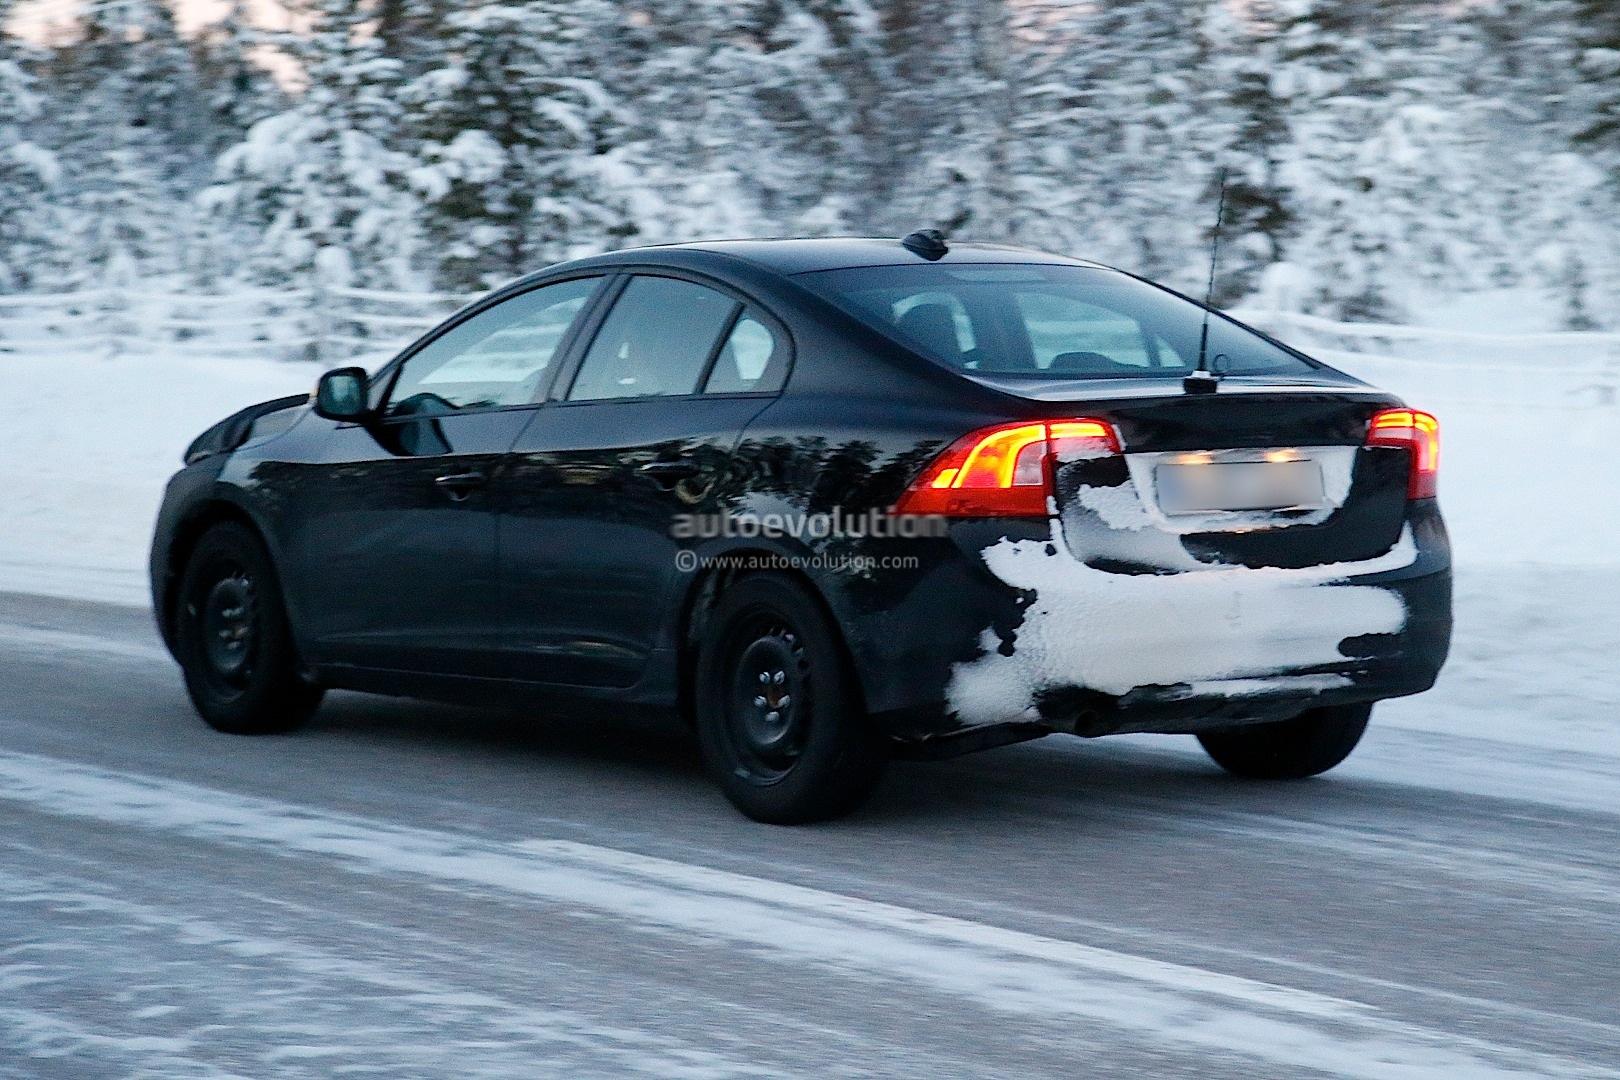 Spyshots: 2014 Volvo S60 Facelift Gets Interior Update ...